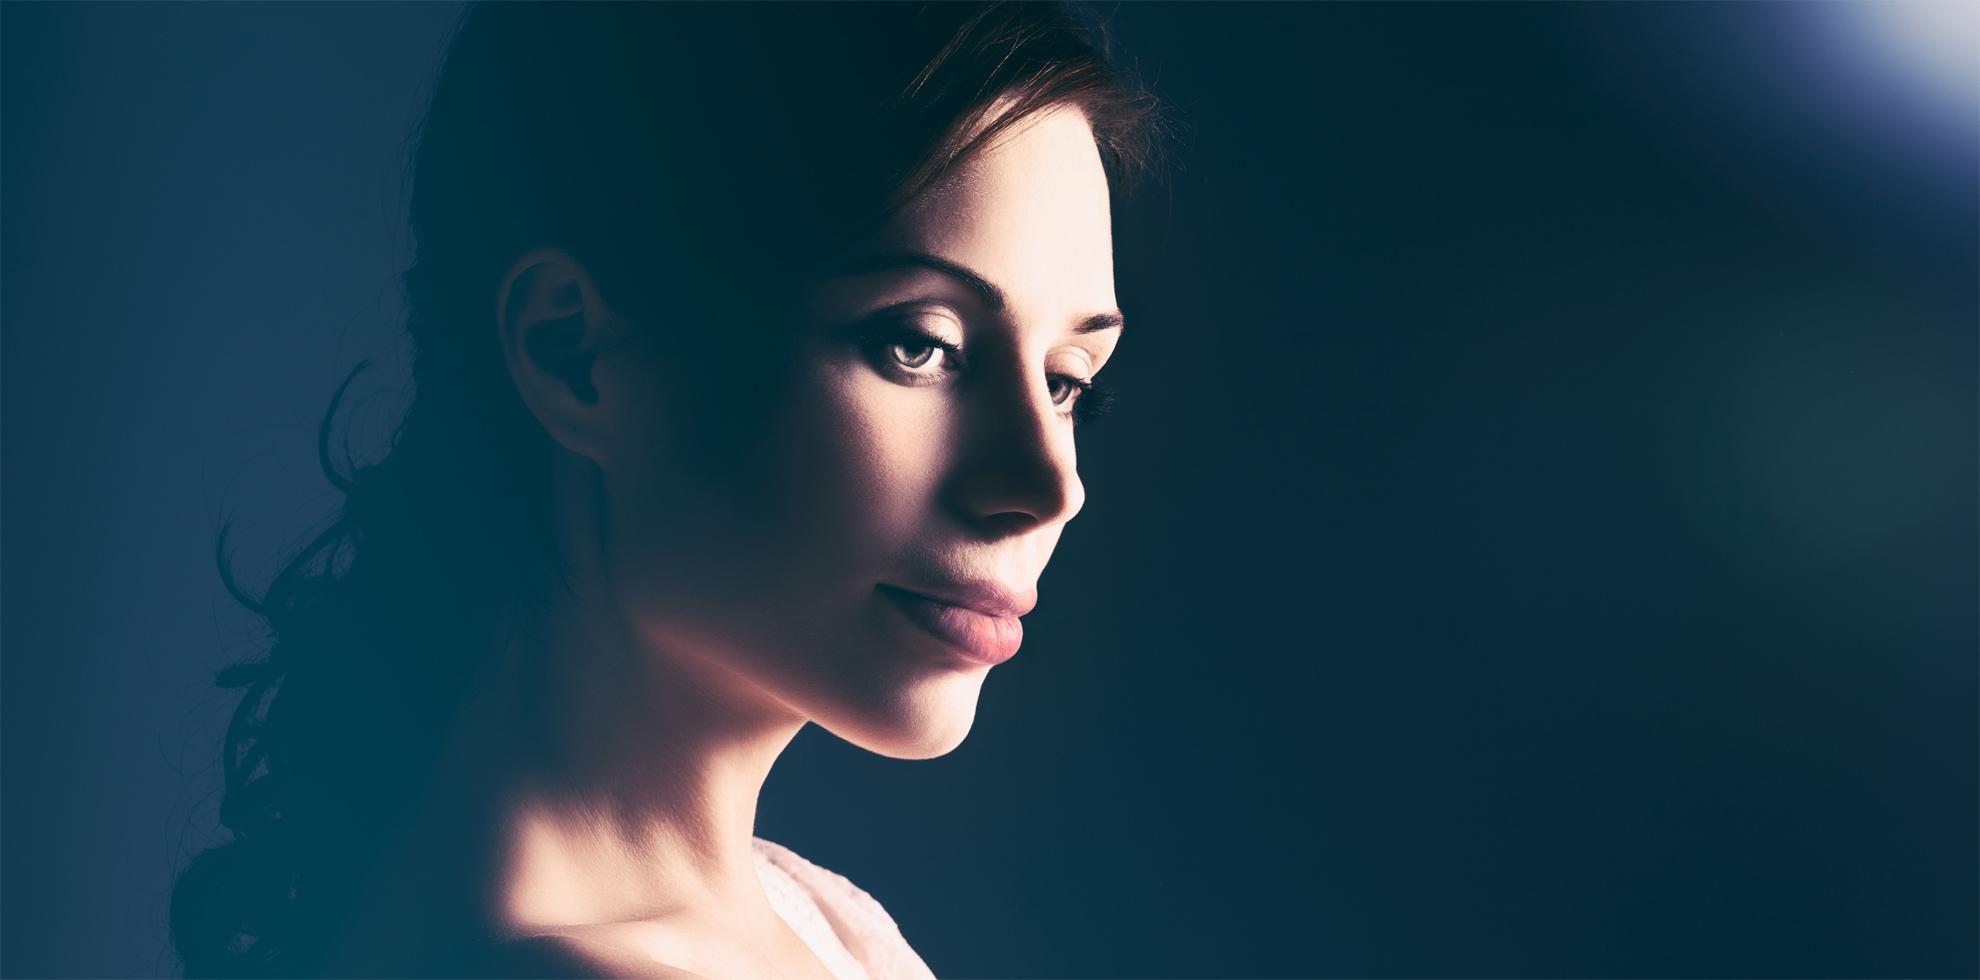 Kosmetologia blog - medycyna estetyczna